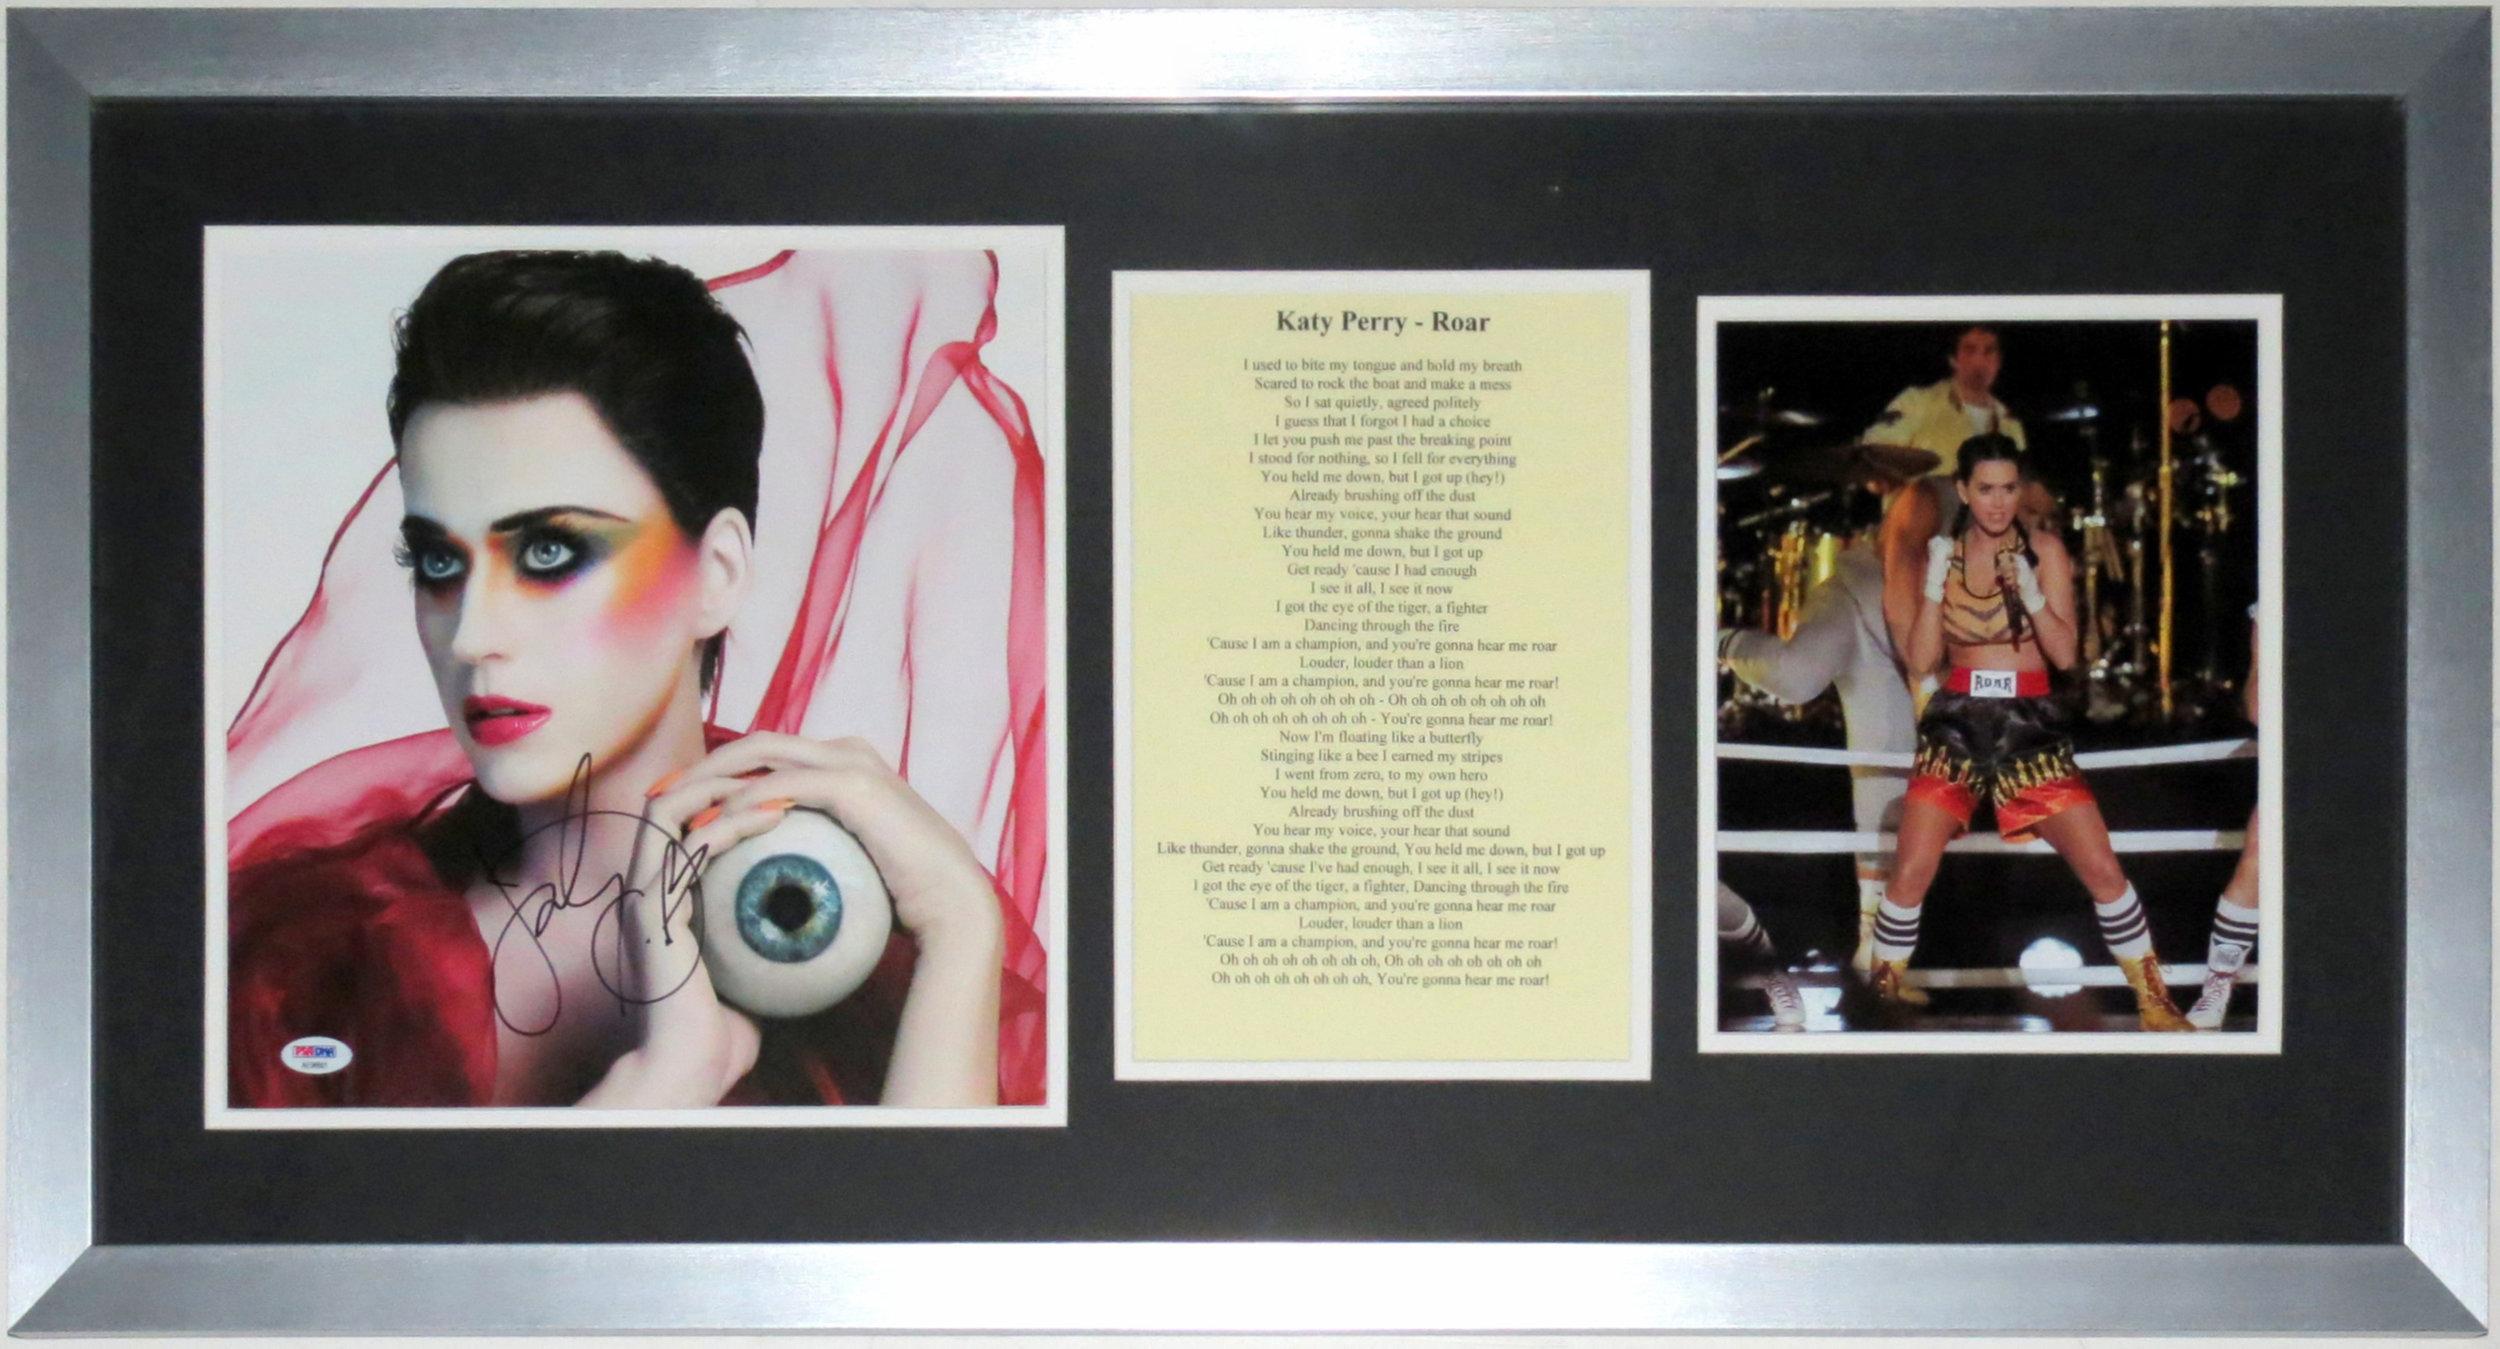 Katy Perry Signed 10x10 Photo Compilation - PSA DNA COA Authenticated - Professionally Framed & Concert 8x10 Photo & Lyrics